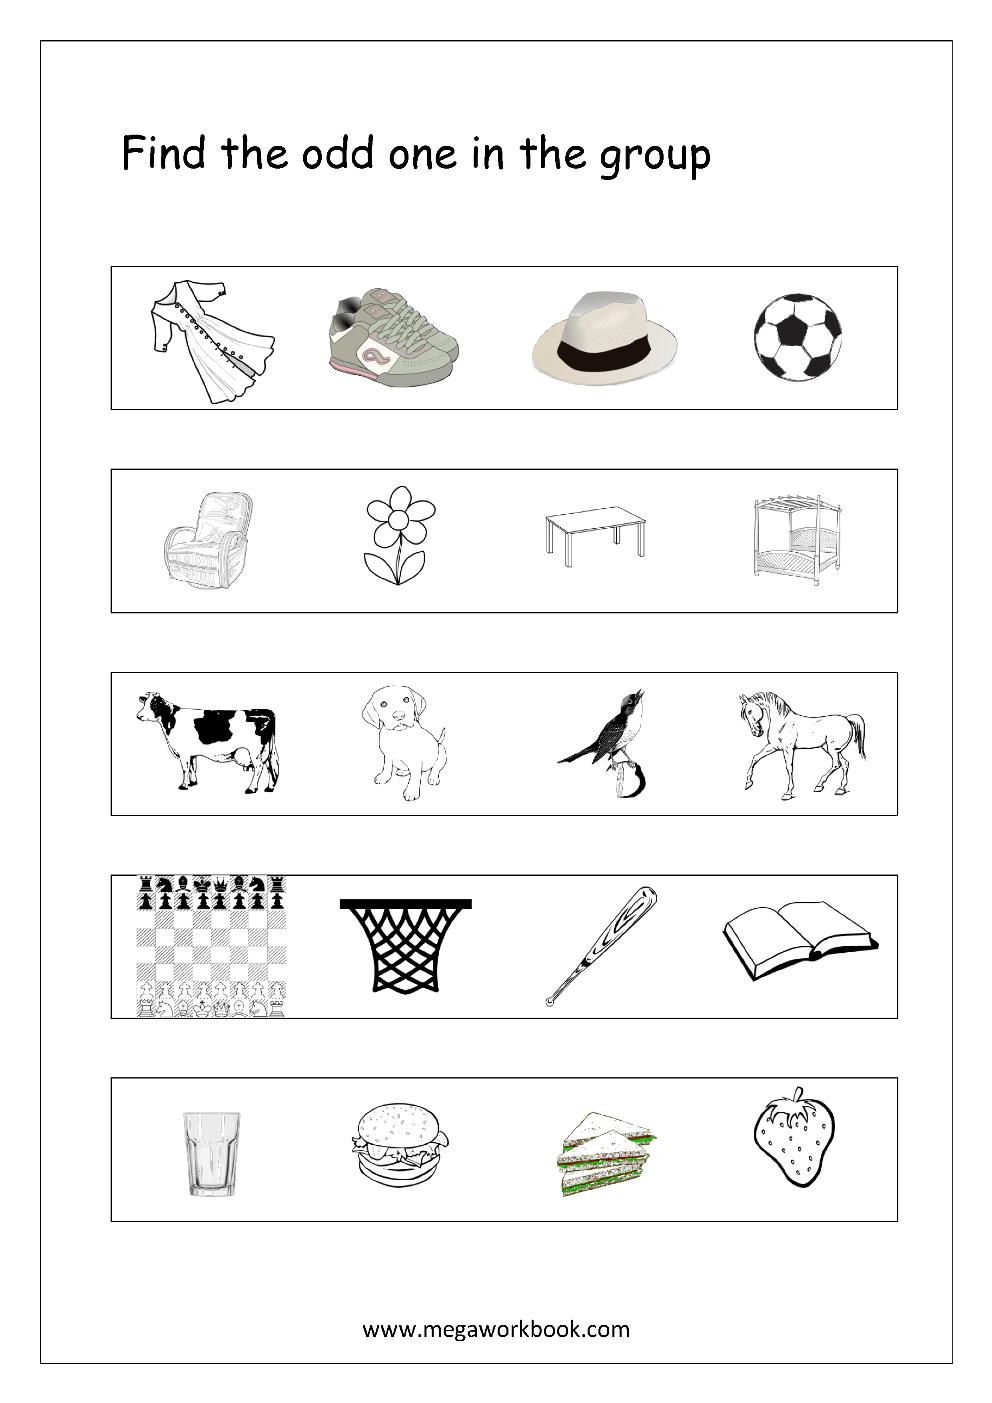 Free General Aptitude Worksheets - Odd One Out - Megaworkbook - Free Printable Worksheets For Kids Science